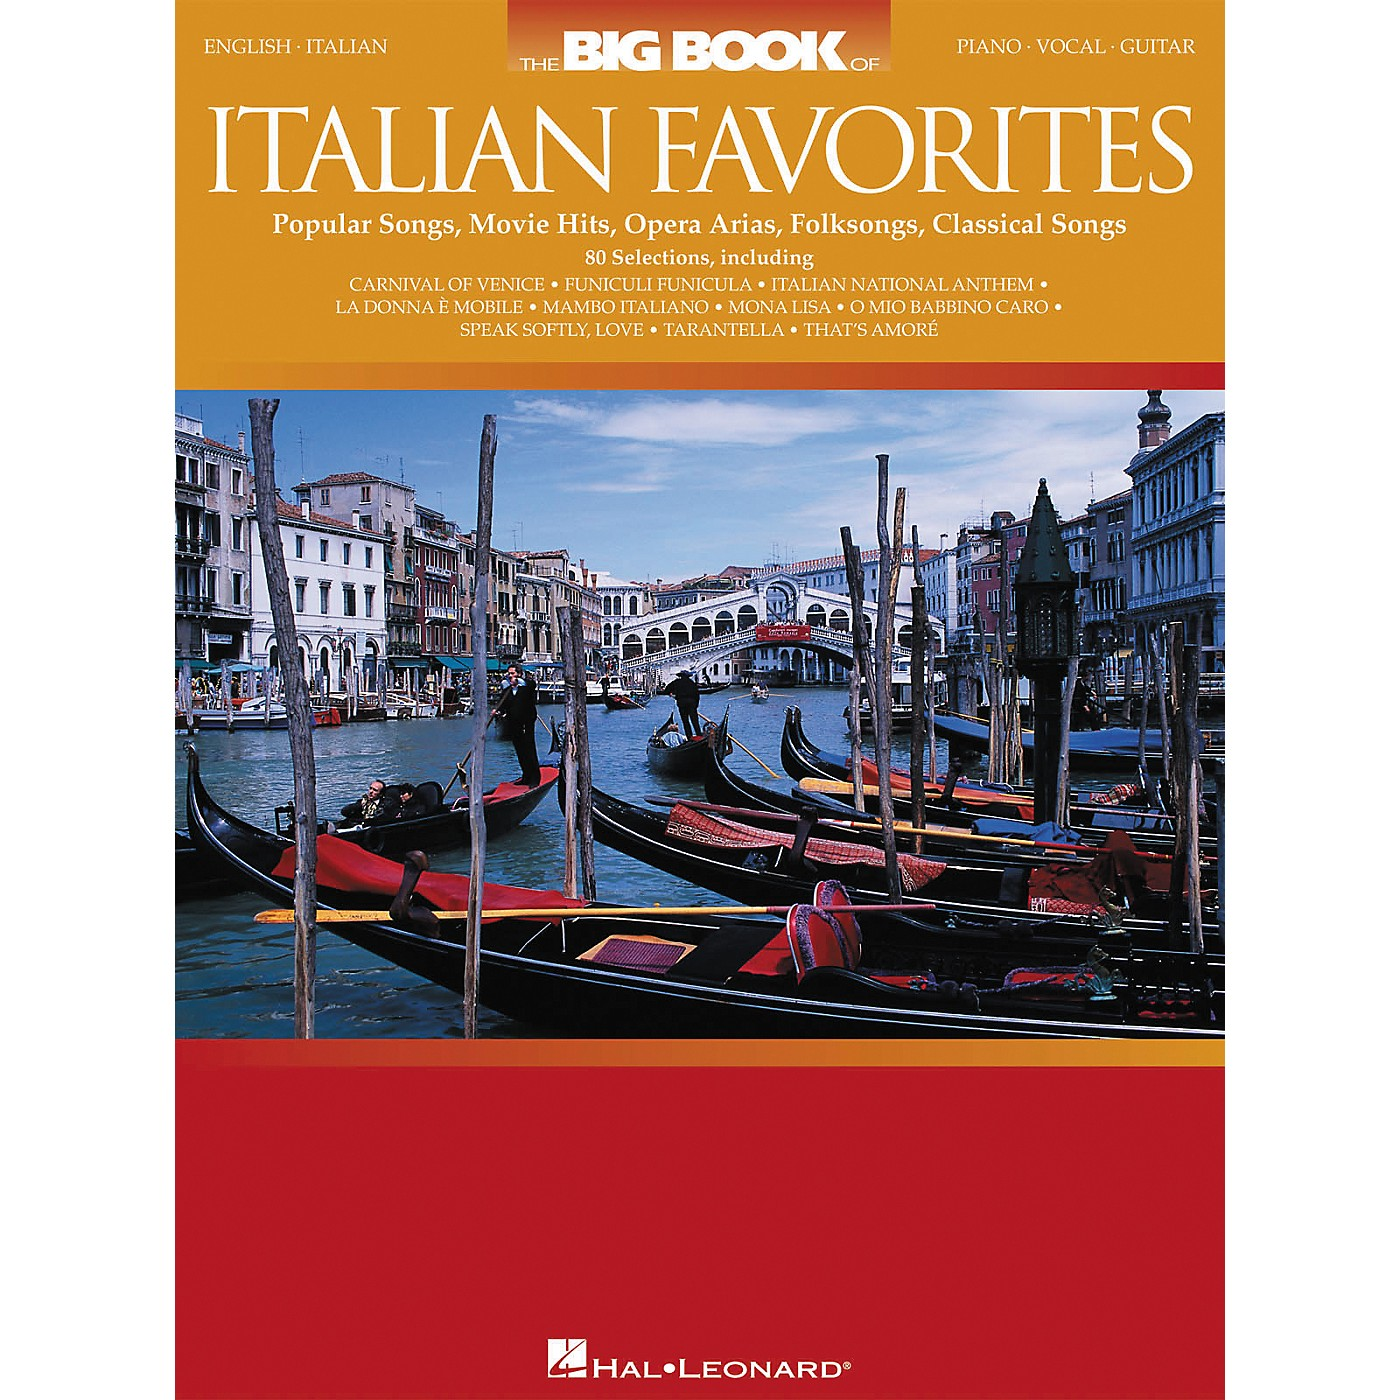 Hal Leonard The Big Book of Italian Favorites Piano/Vocal/Guitar Songbook thumbnail